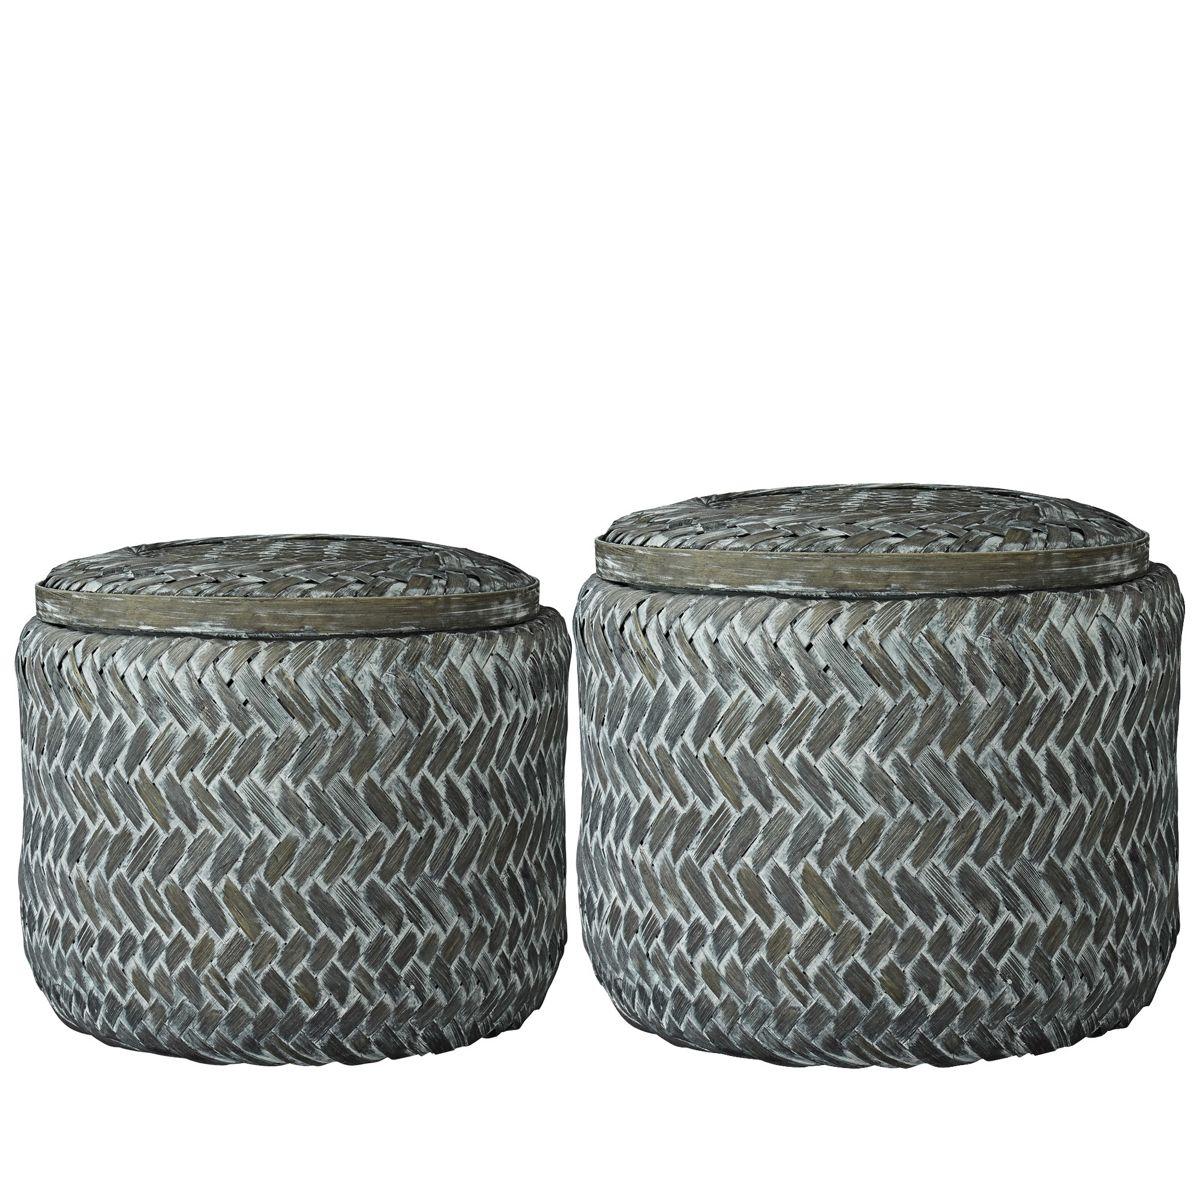 Koszyk pojemnik bambusowy jasira basket item a00002083 lene bjerre dekoracje pude ka for Petits rangements